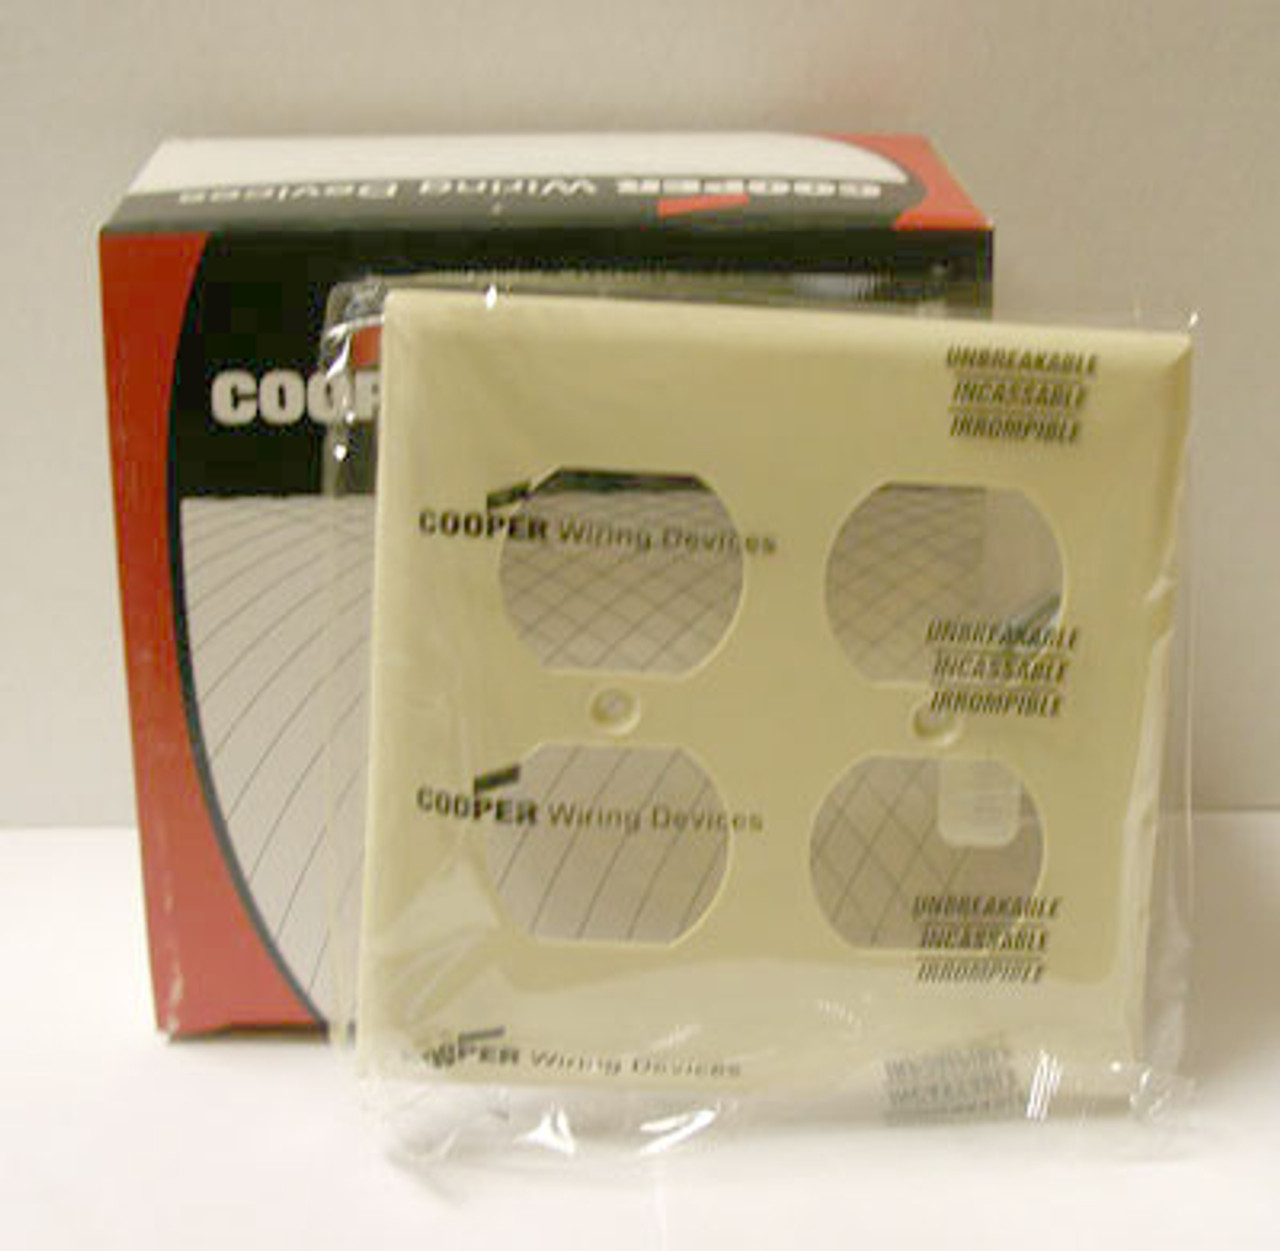 Cooper 5150V 2 Gang Ivory Hospital Receptacle Plate (Lot of 20) - New